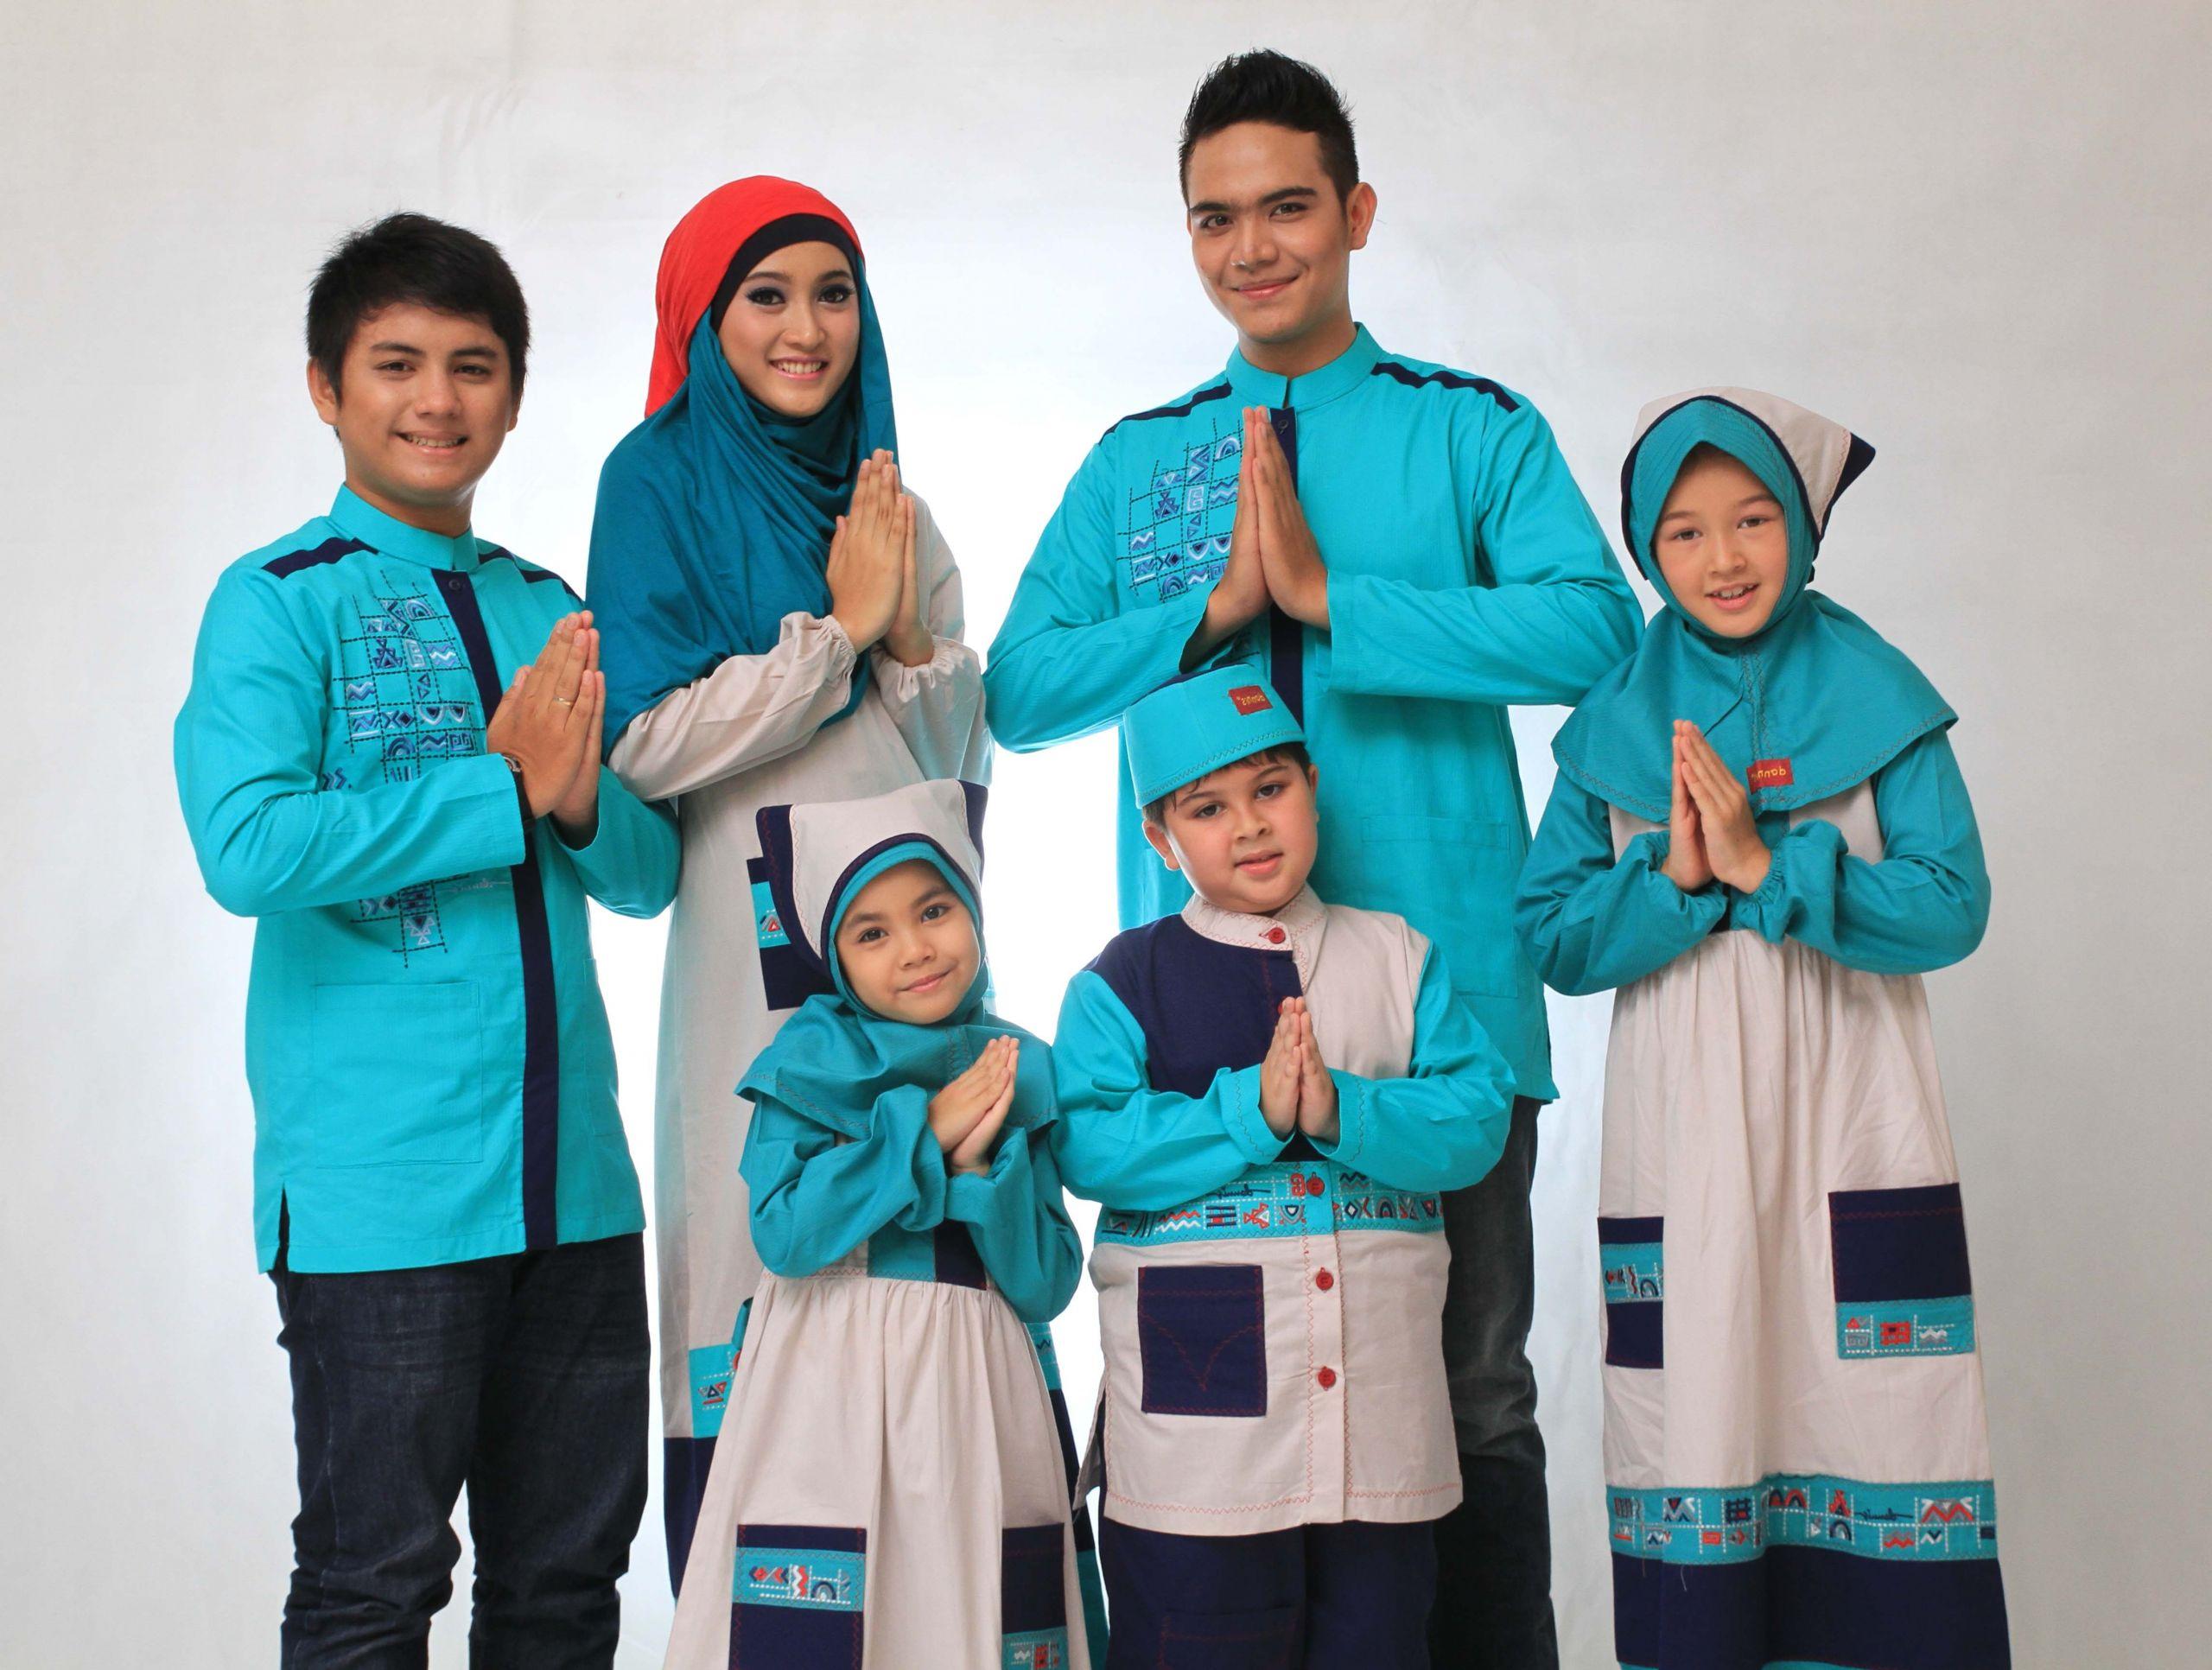 Design Baju Lebaran Keluarga Tahun 2019 3ldq Baju Muslim Untuk Lebaran Berhijab